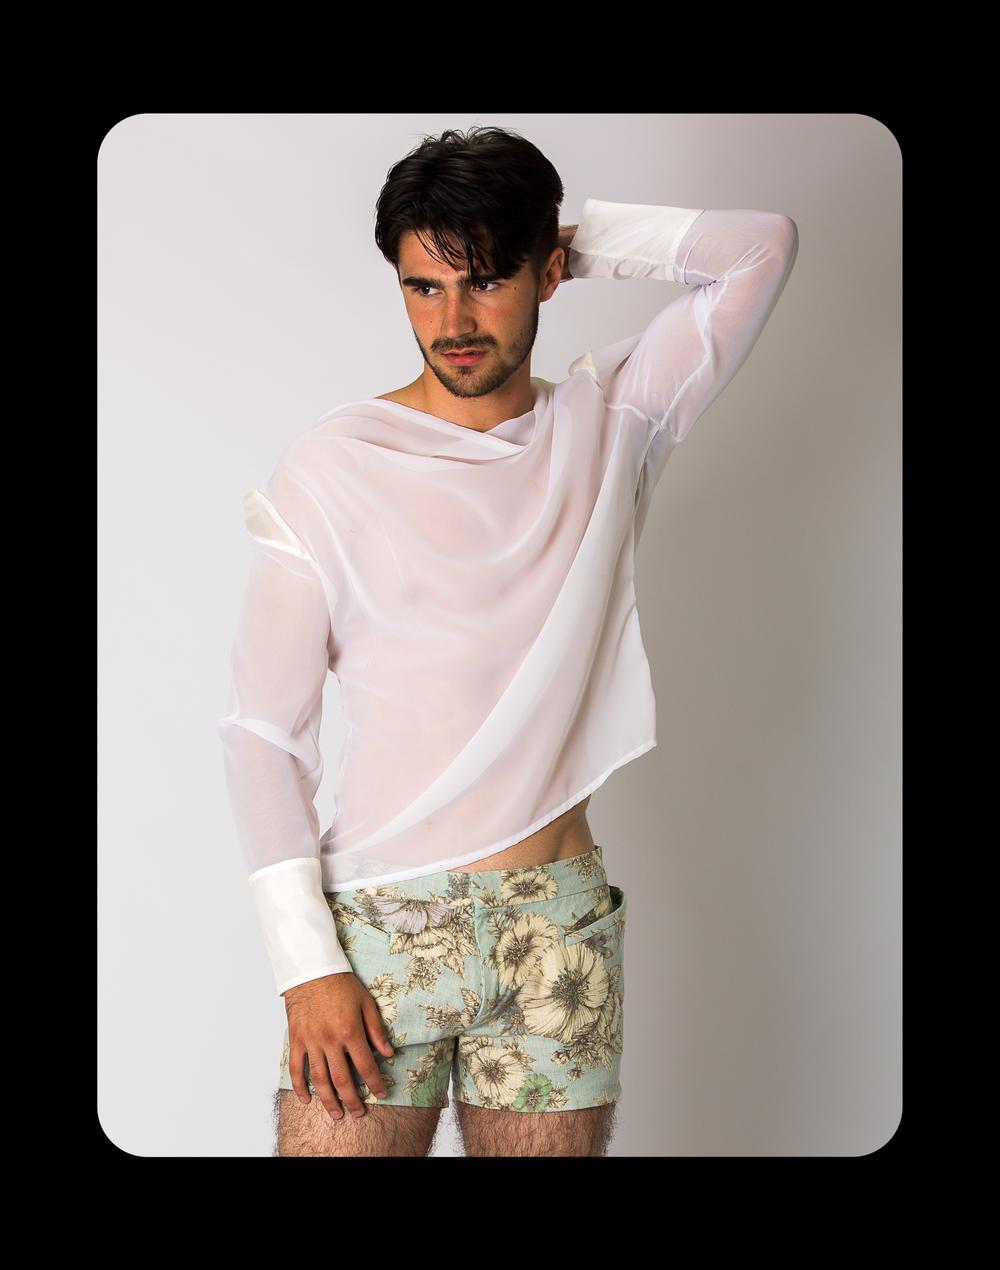 Raul Flores Desins Mens Underwear 2015-1 (dragged) 6.jpg